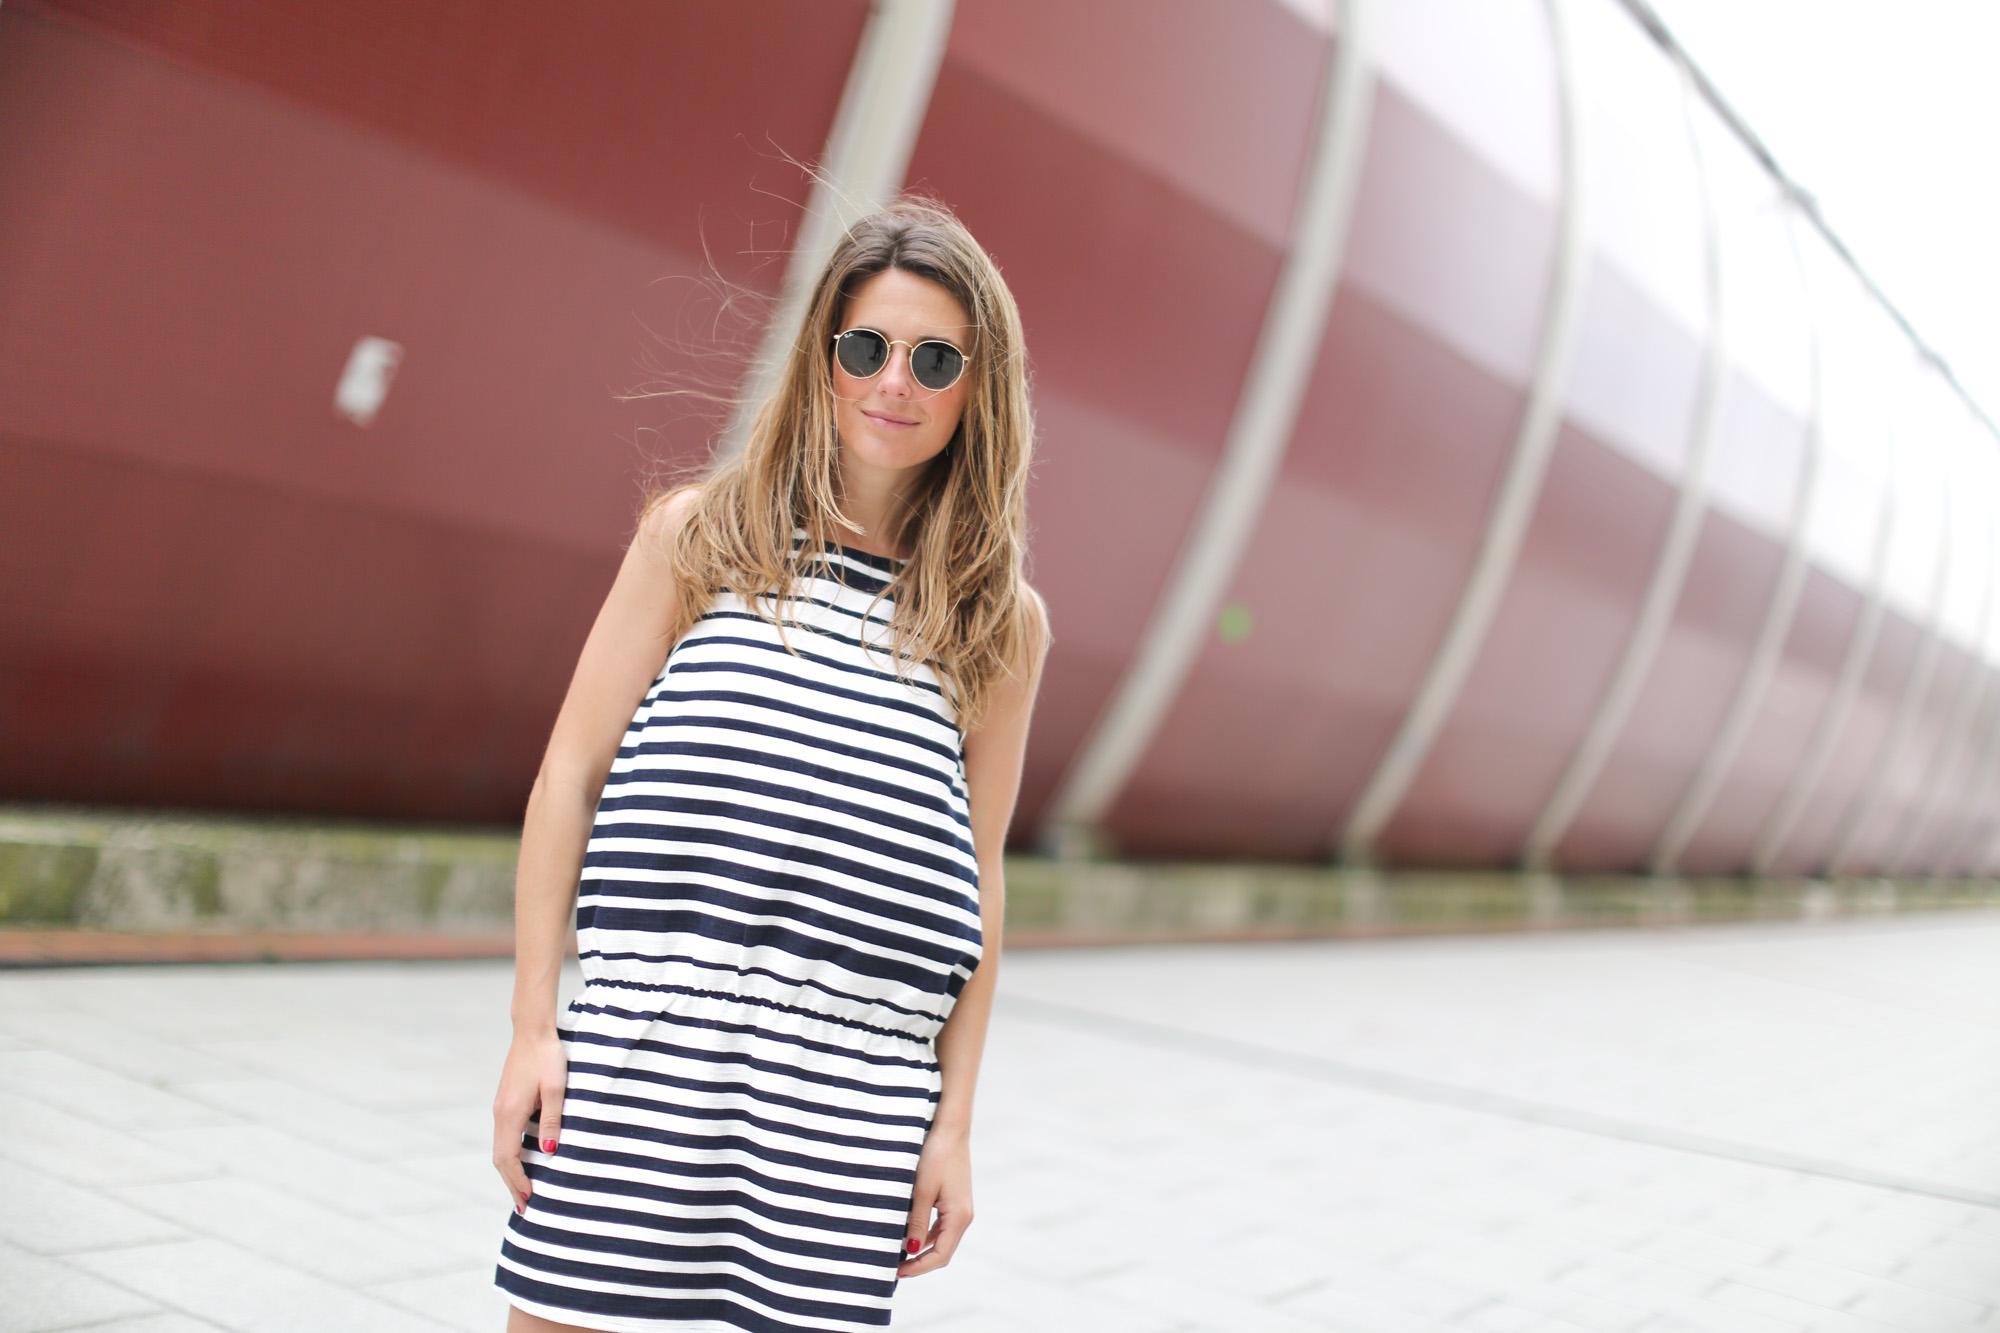 Clochet-streetstyle-suiteblanco-denim-jacket-stripped-dress-superga-classic-navy-5